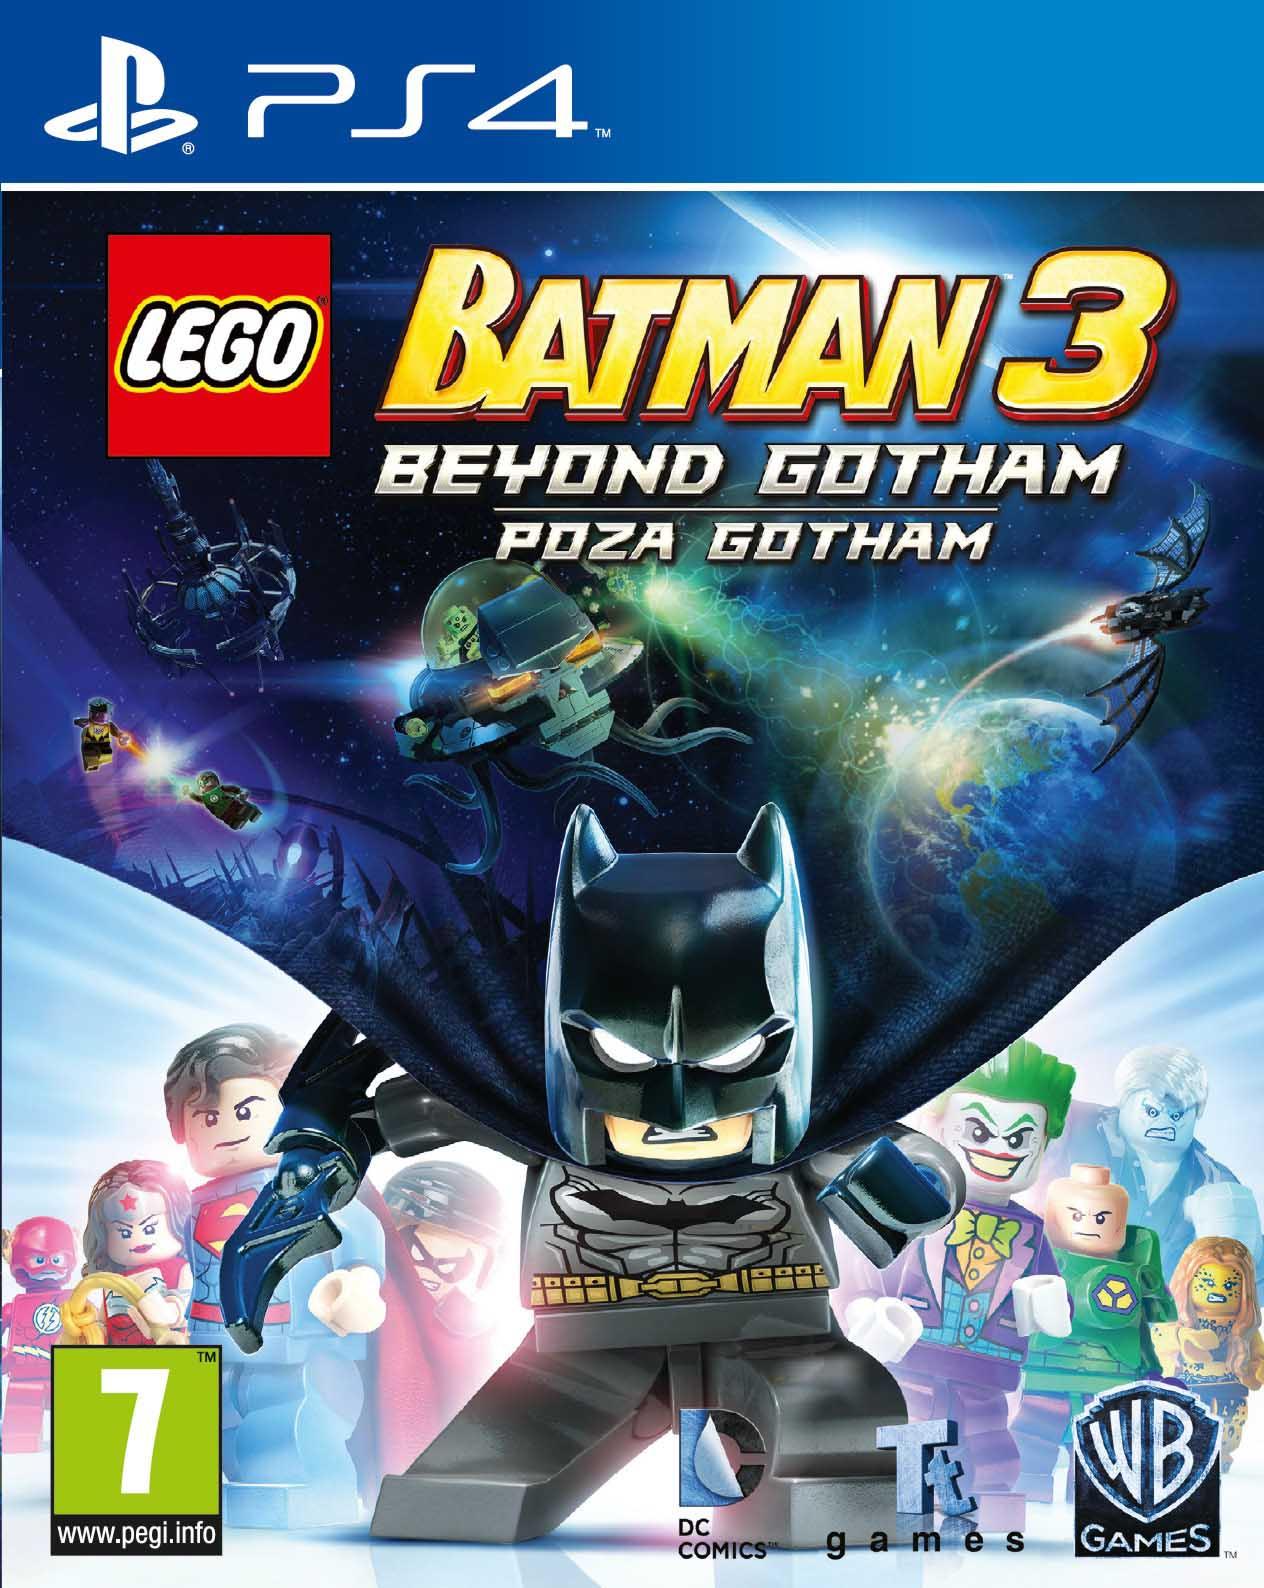 LEGO BATMAN 3: BEYOND GOTHAM - PS4